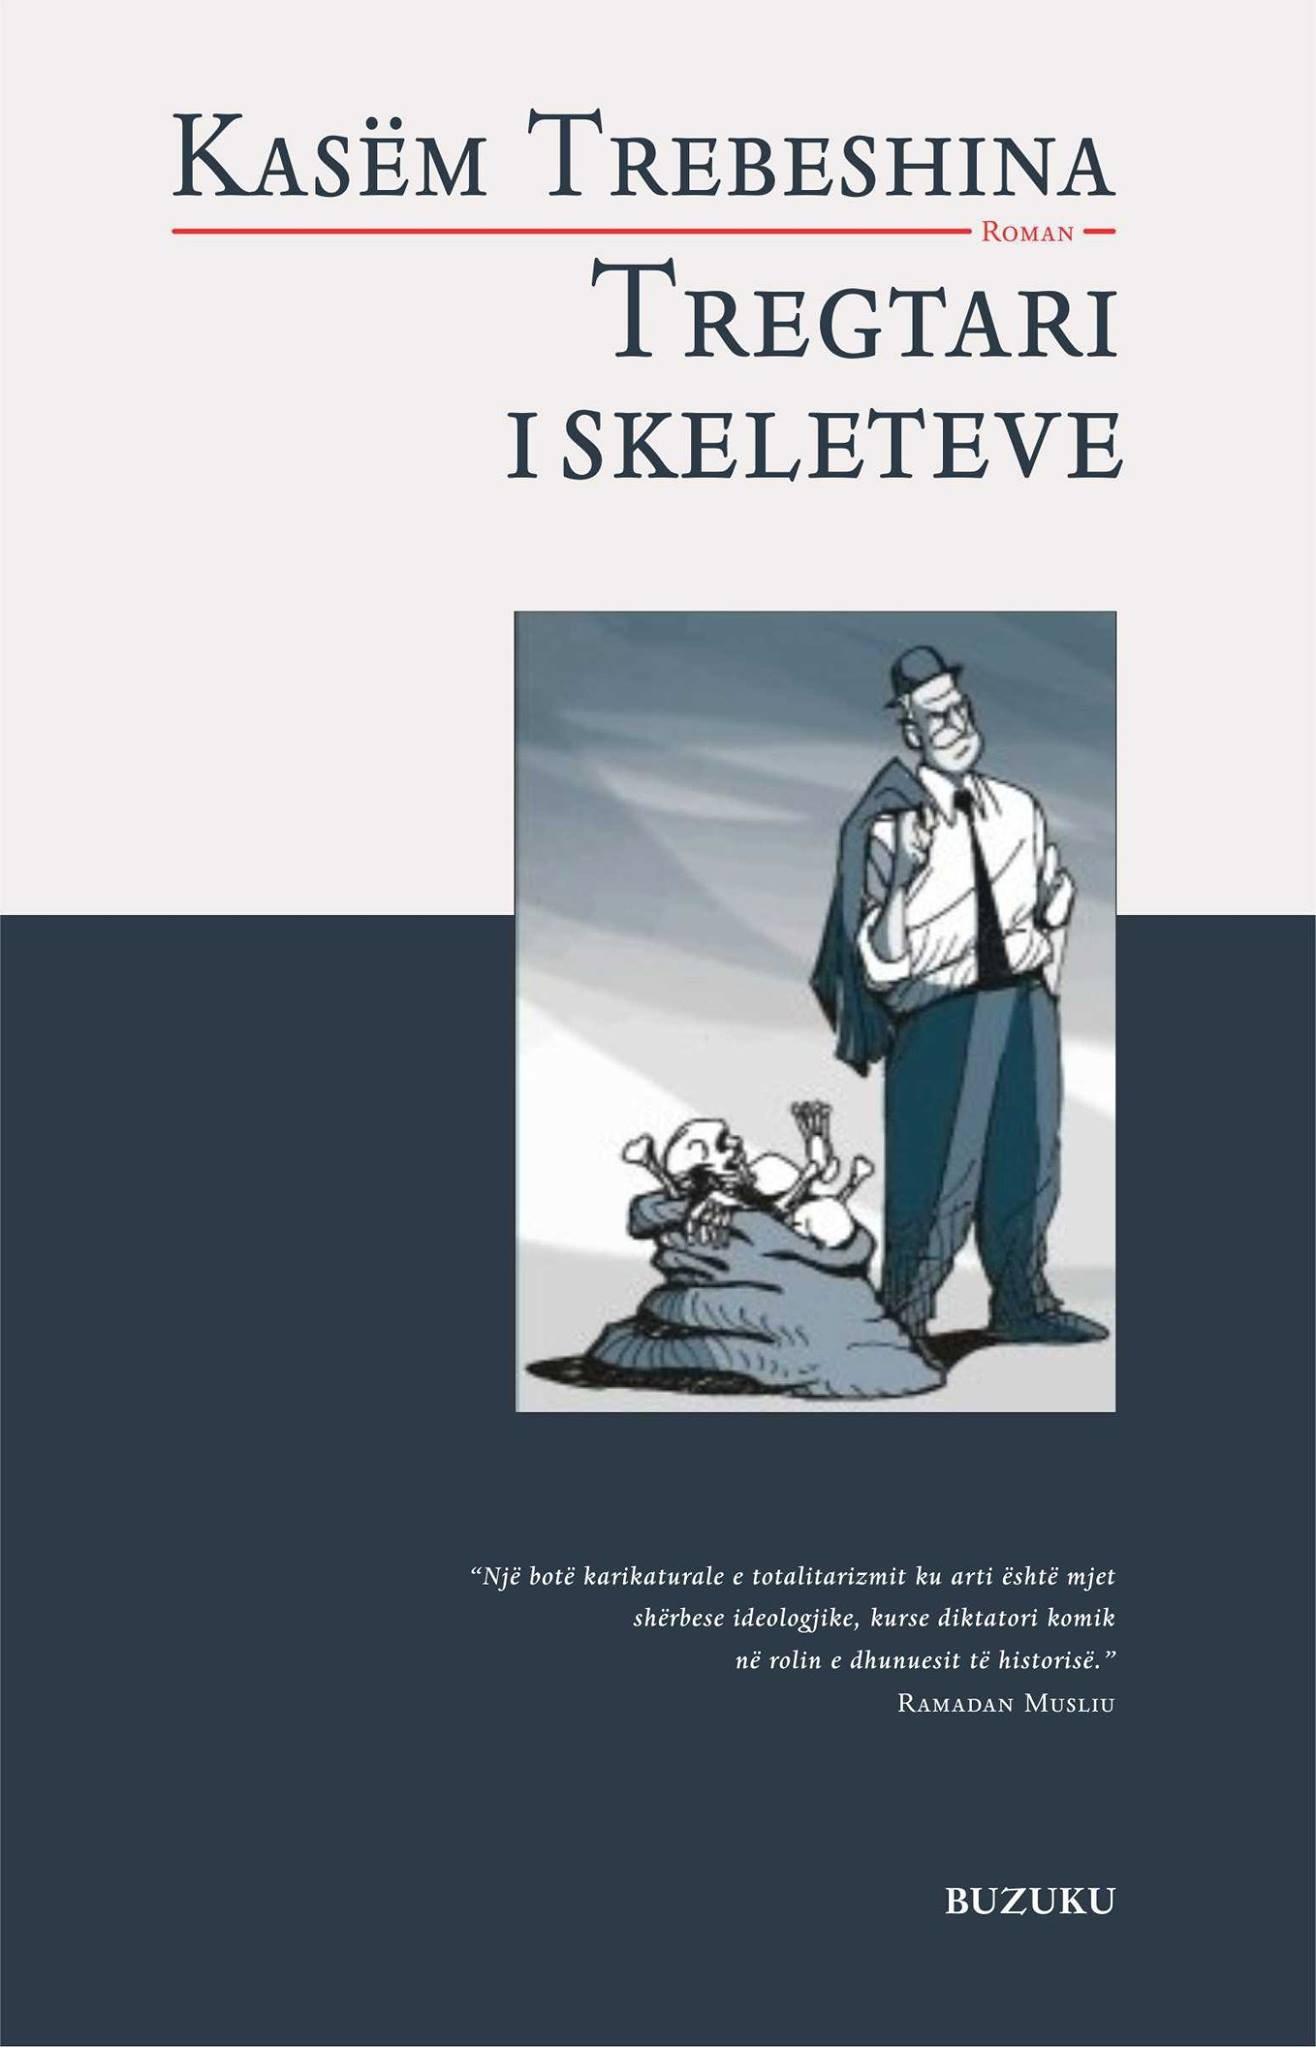 Sekreti i skeleteve